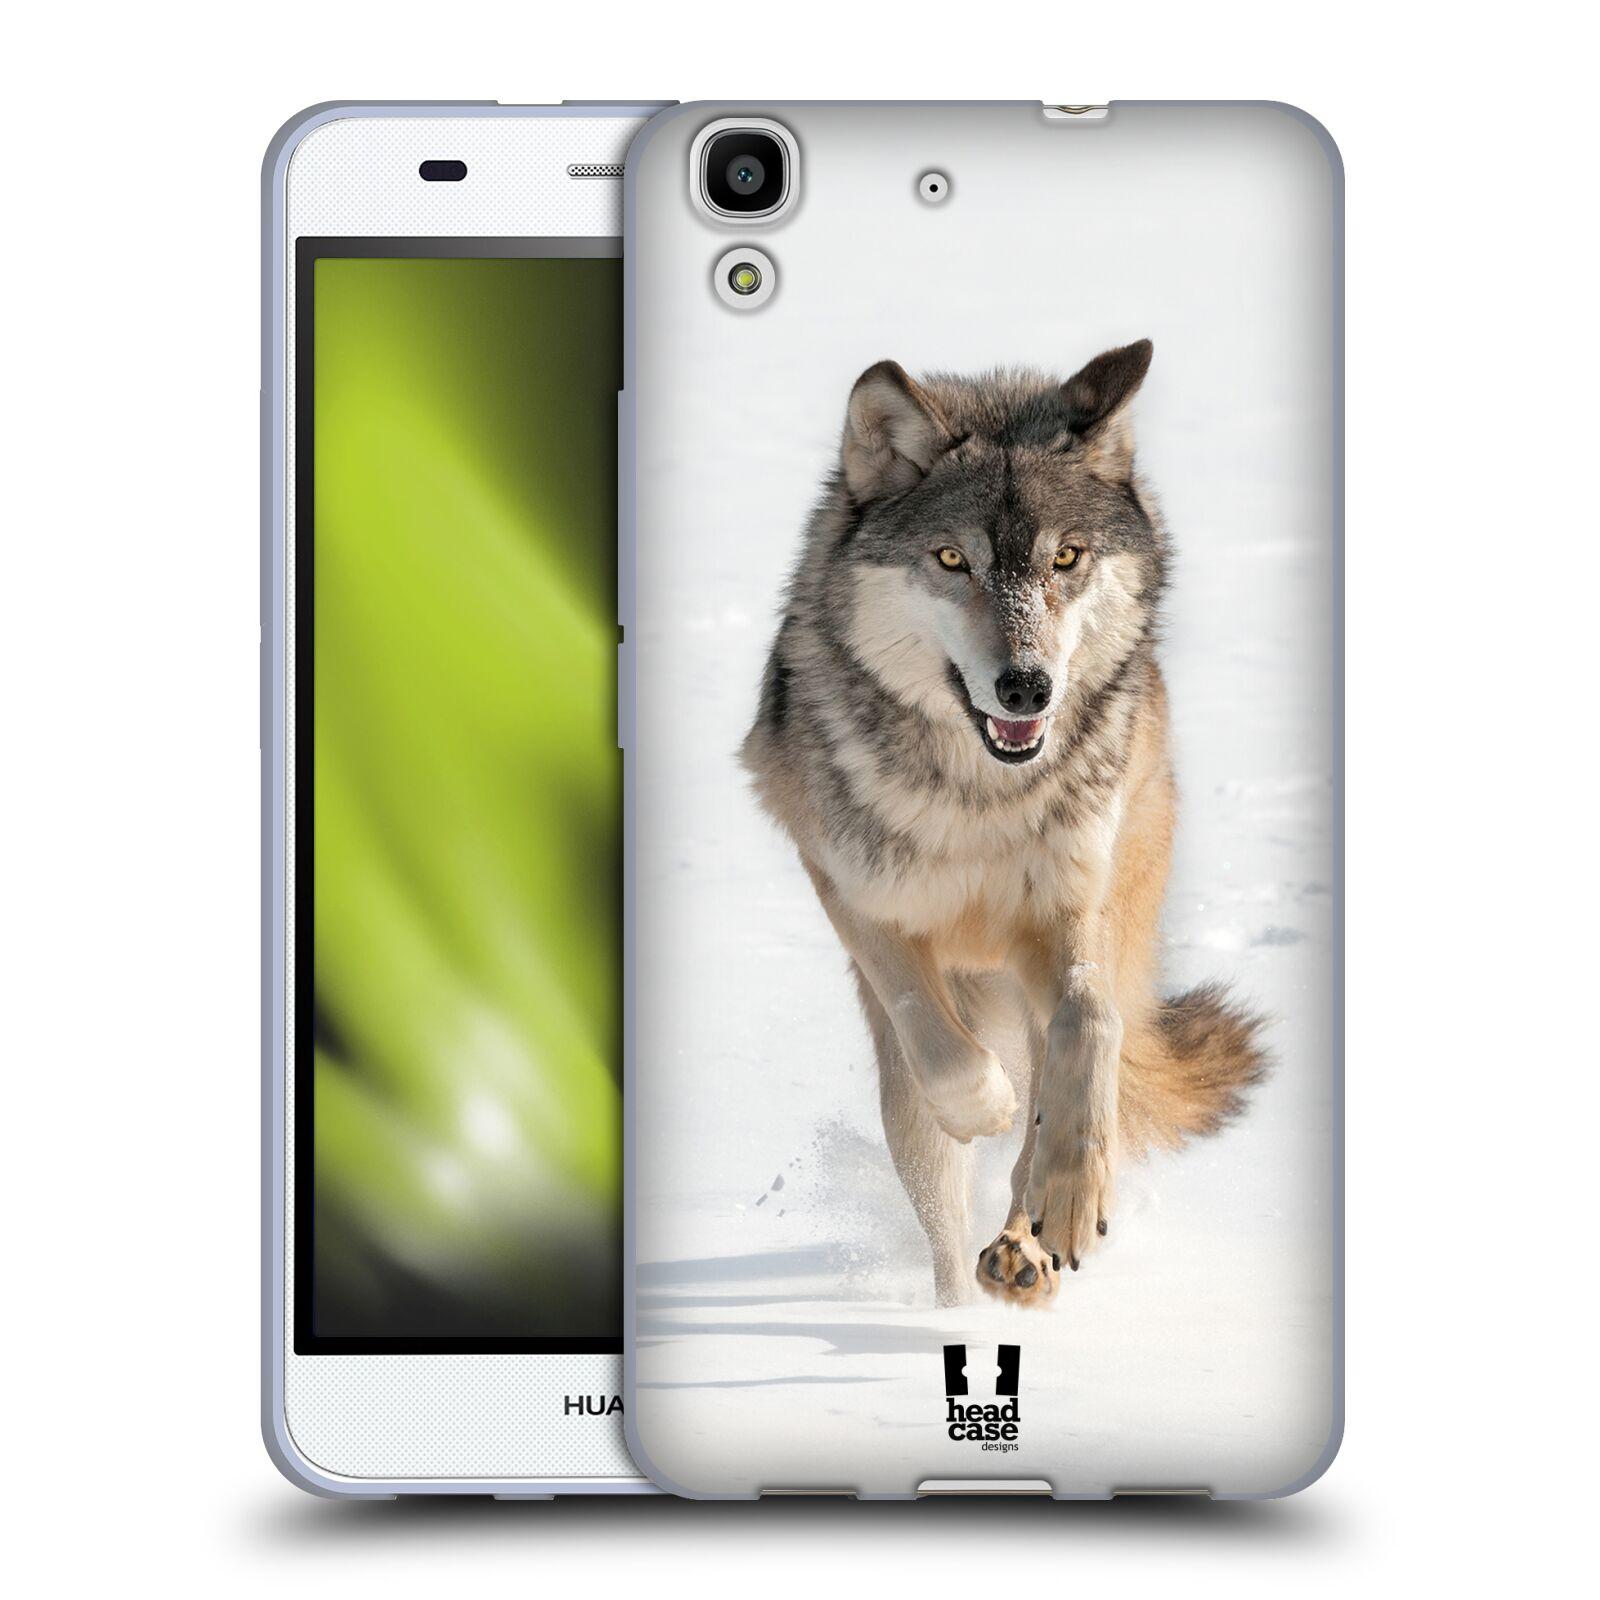 HEAD CASE silikonový obal na mobil HUAWEI Y6 vzor Divočina, Divoký život a zvířata foto BĚŽÍCÍ VLK